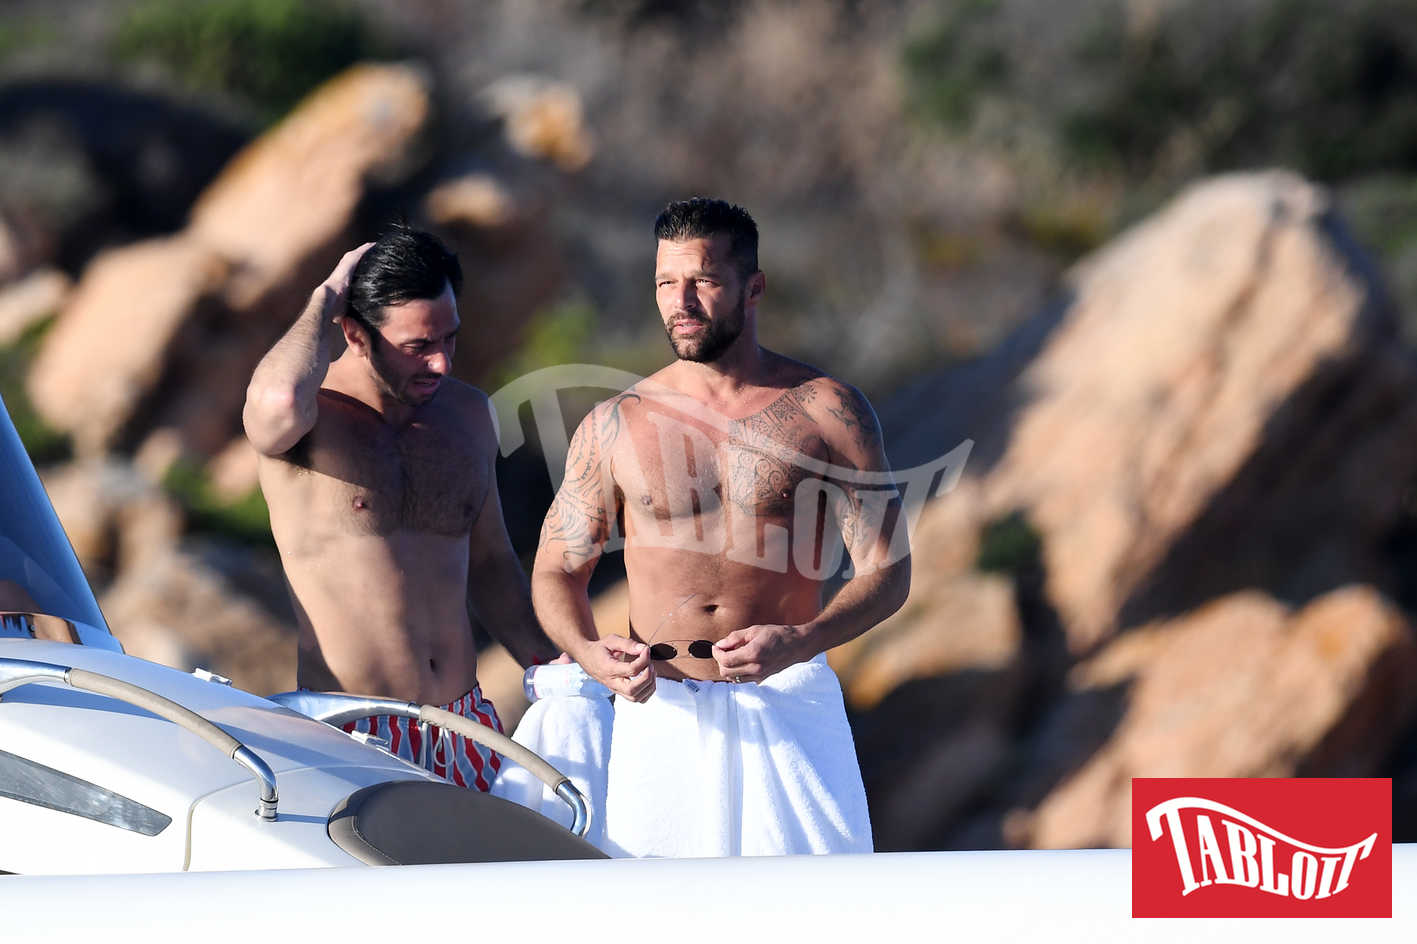 Ricky Martin insieme al Jwan Yosef durante una gita in gommone in sardegna